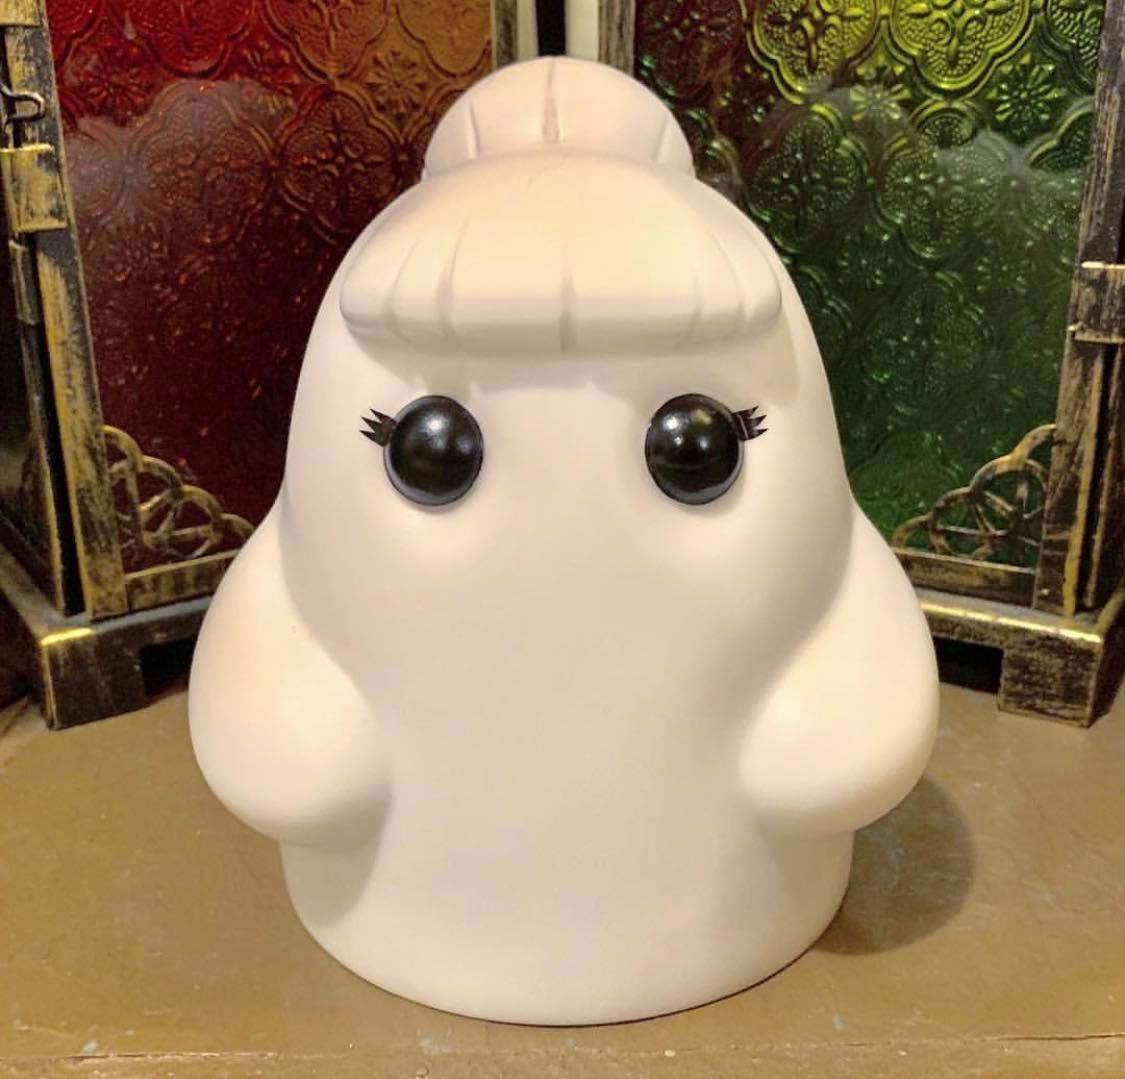 Bimtoy Luna Tiny Ghost OG Edition